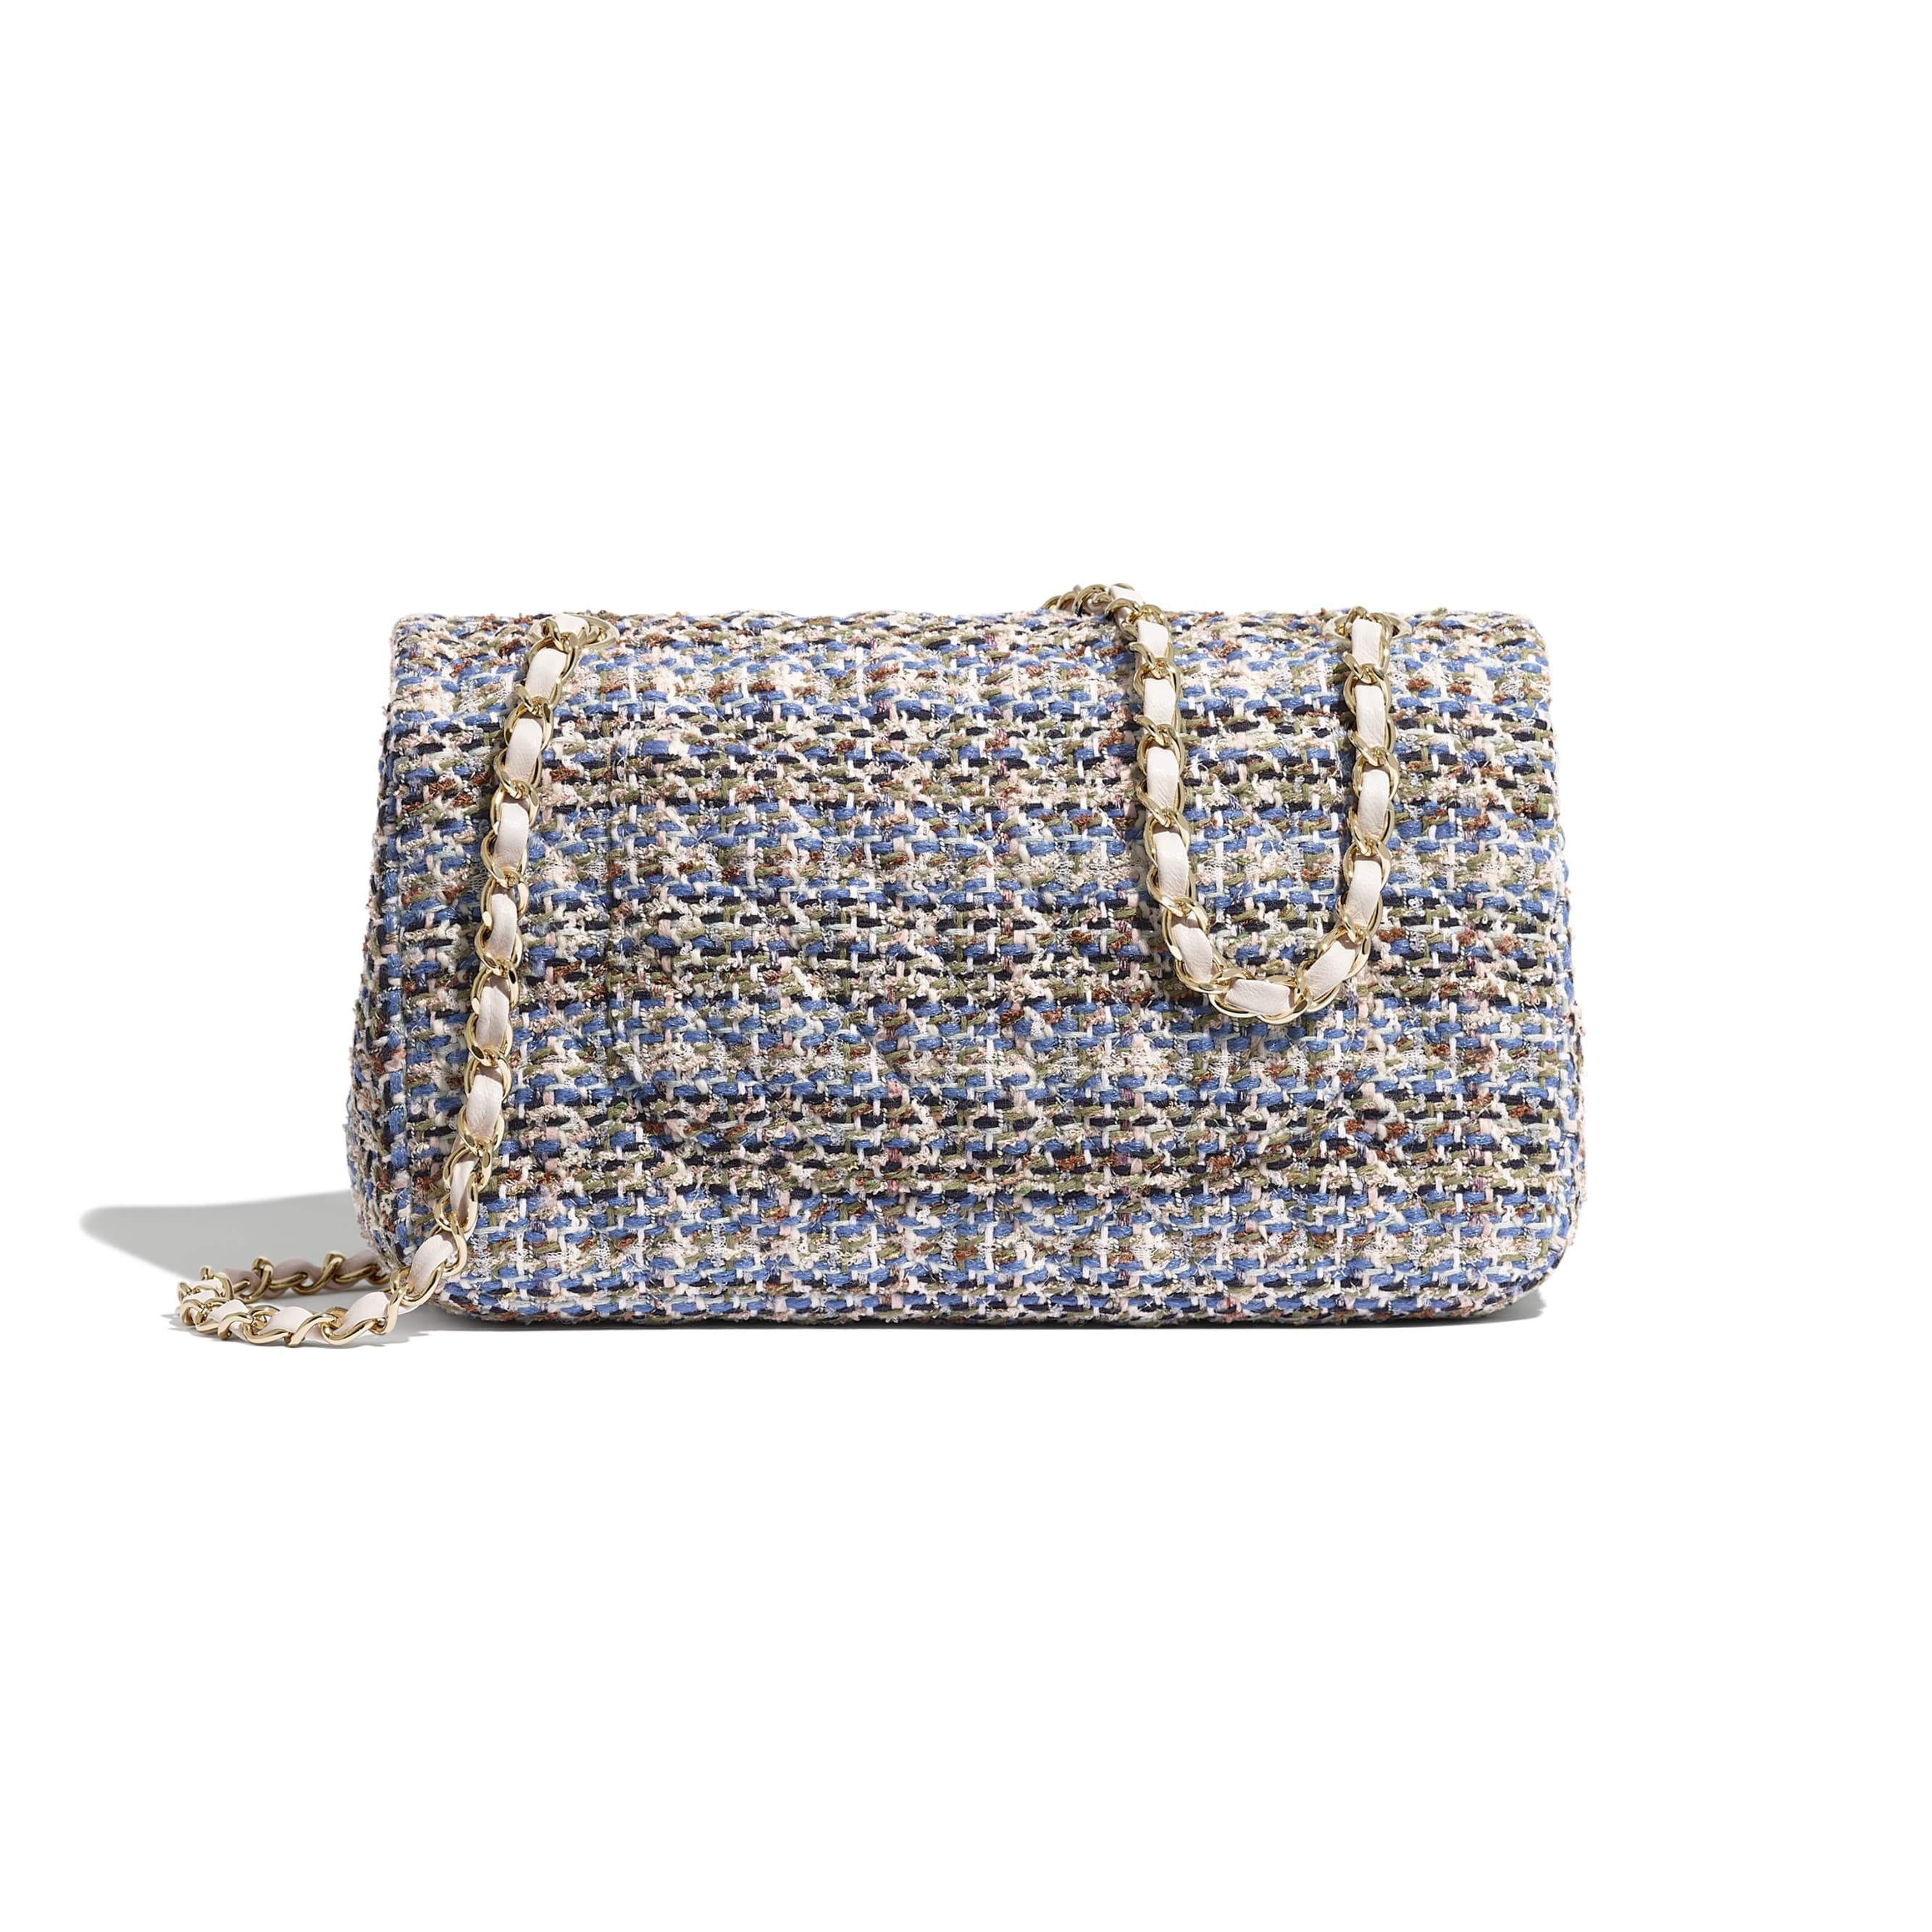 Classic Handbag - Blue, Khaki, White & Navy Blue - Tweed & Gold-Tone Metal - CHANEL - Alternative view - see standard sized version